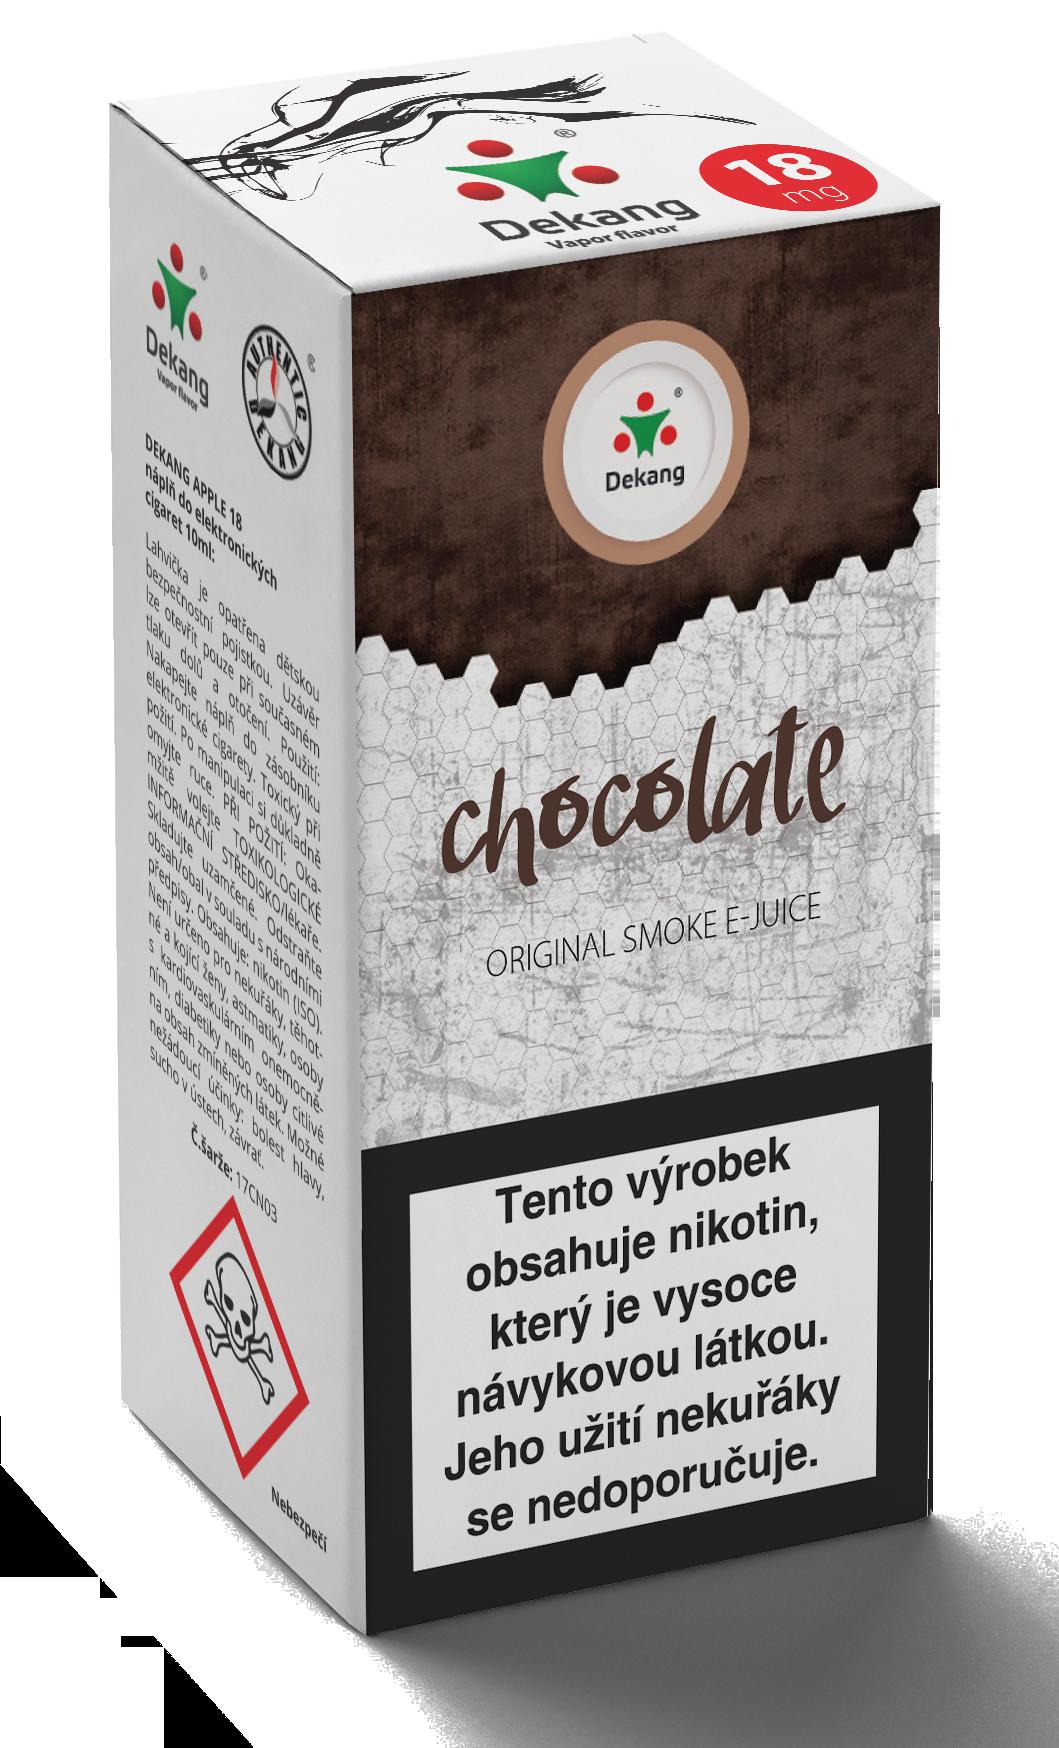 E-liquid Dekang 10ml Čokoláda - Chocolate Množství nikotinu: 16mg